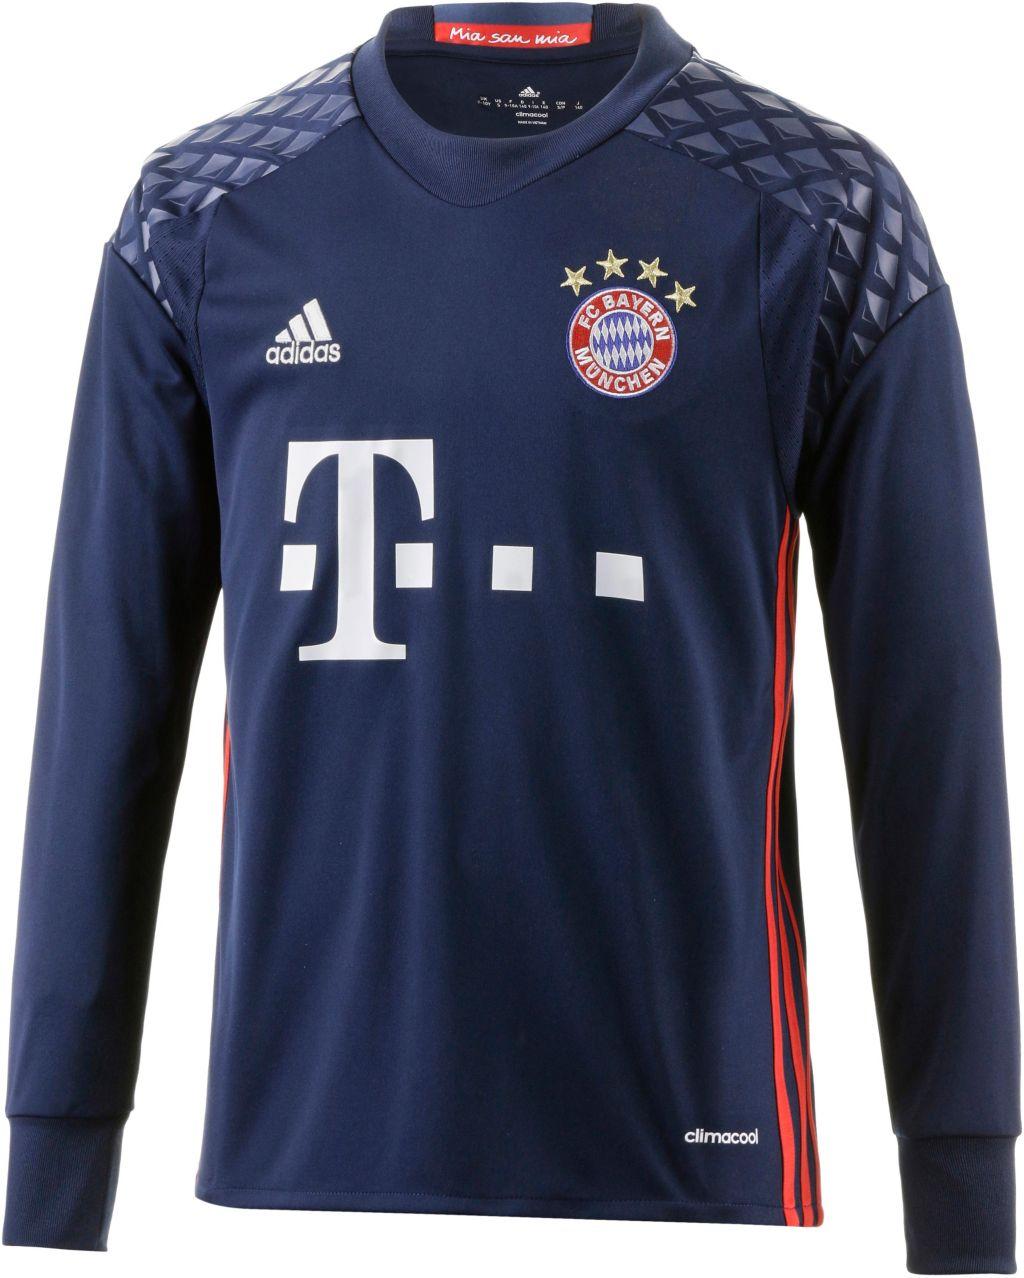 Bild adidas FC Bayern 16/17 Heim Torwarttrikot Kinder